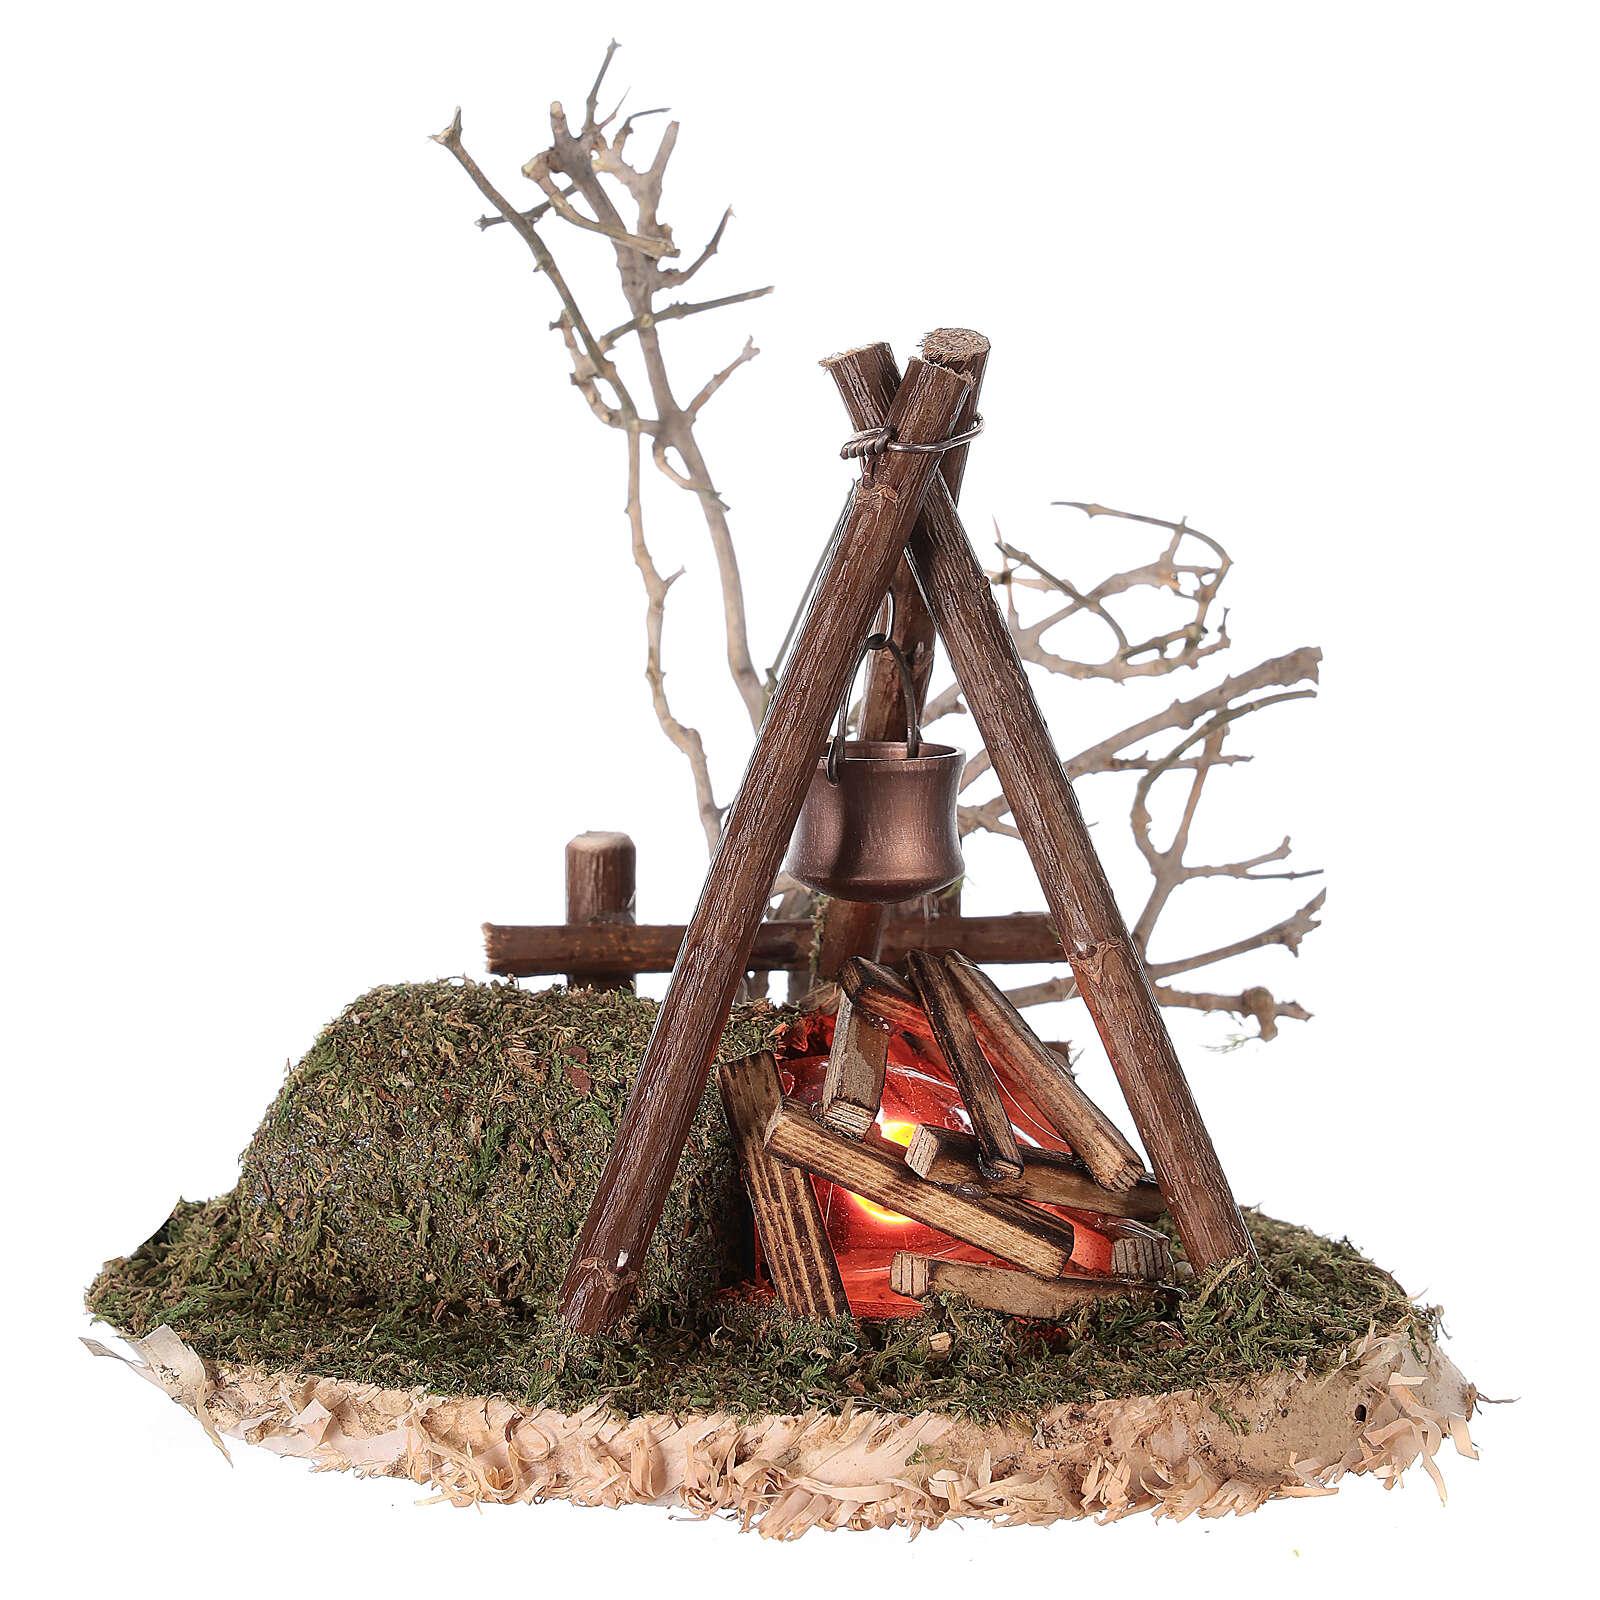 VERDADERO fuego parpadeante campamento 220V para belén 8-10-12 cm 4